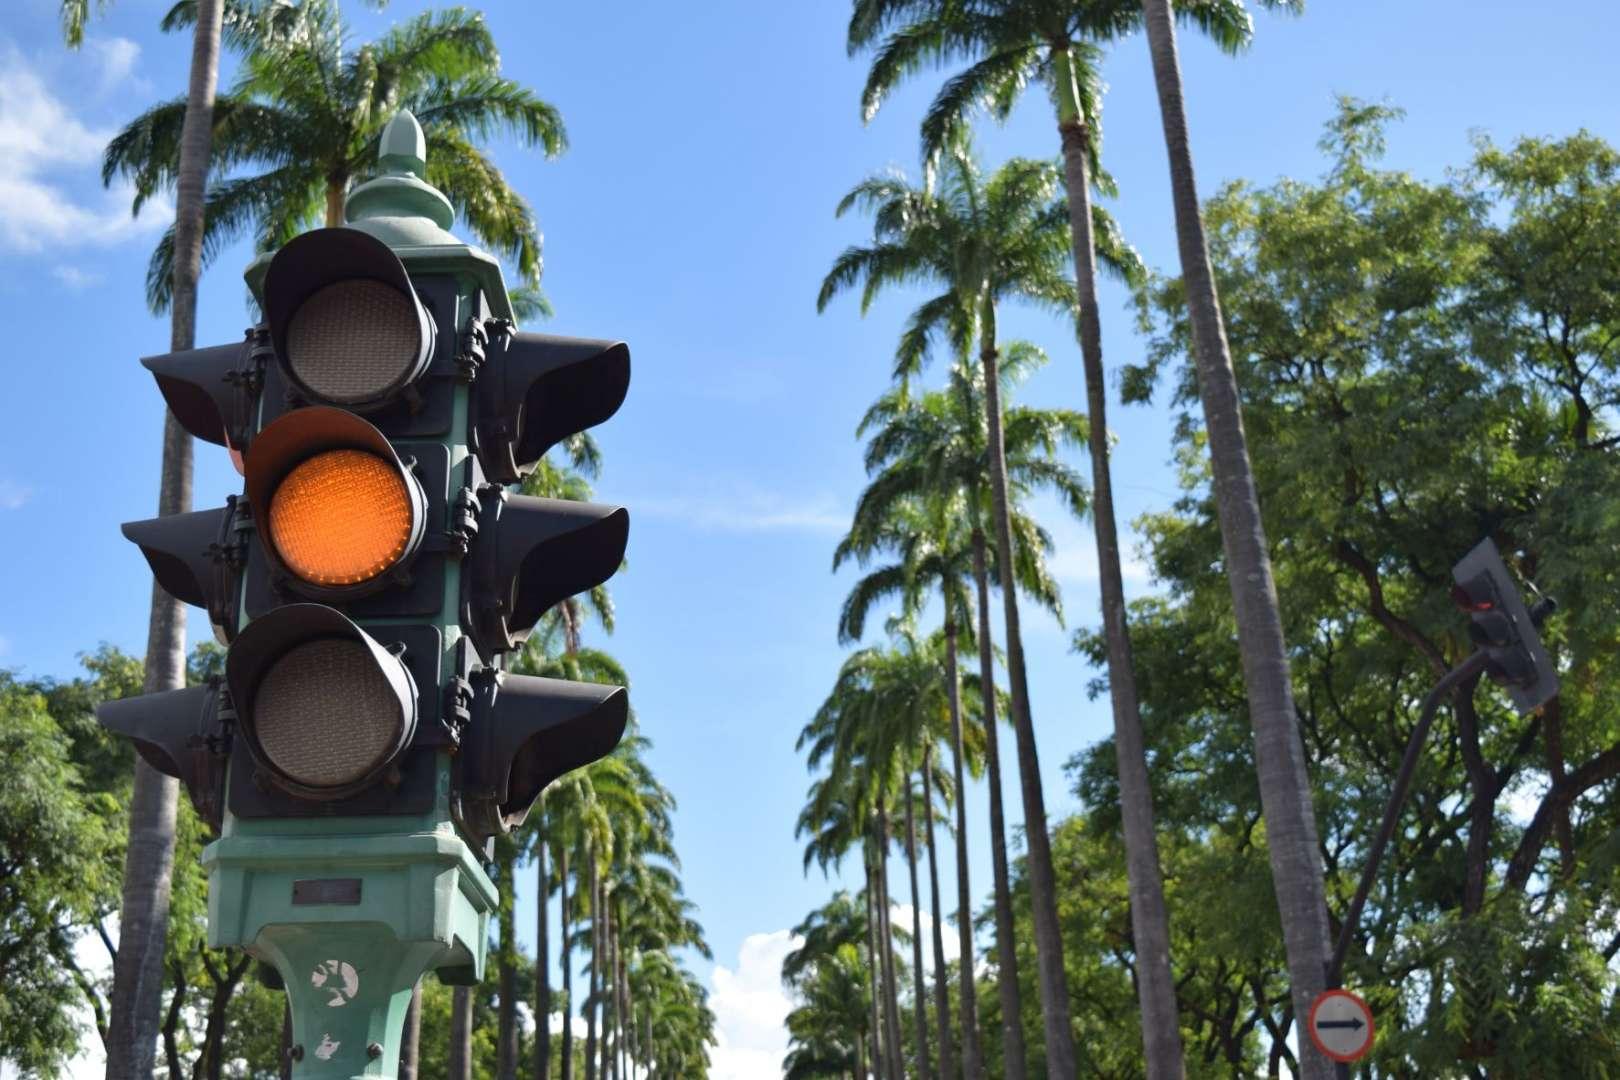 traffic-light-system-removed